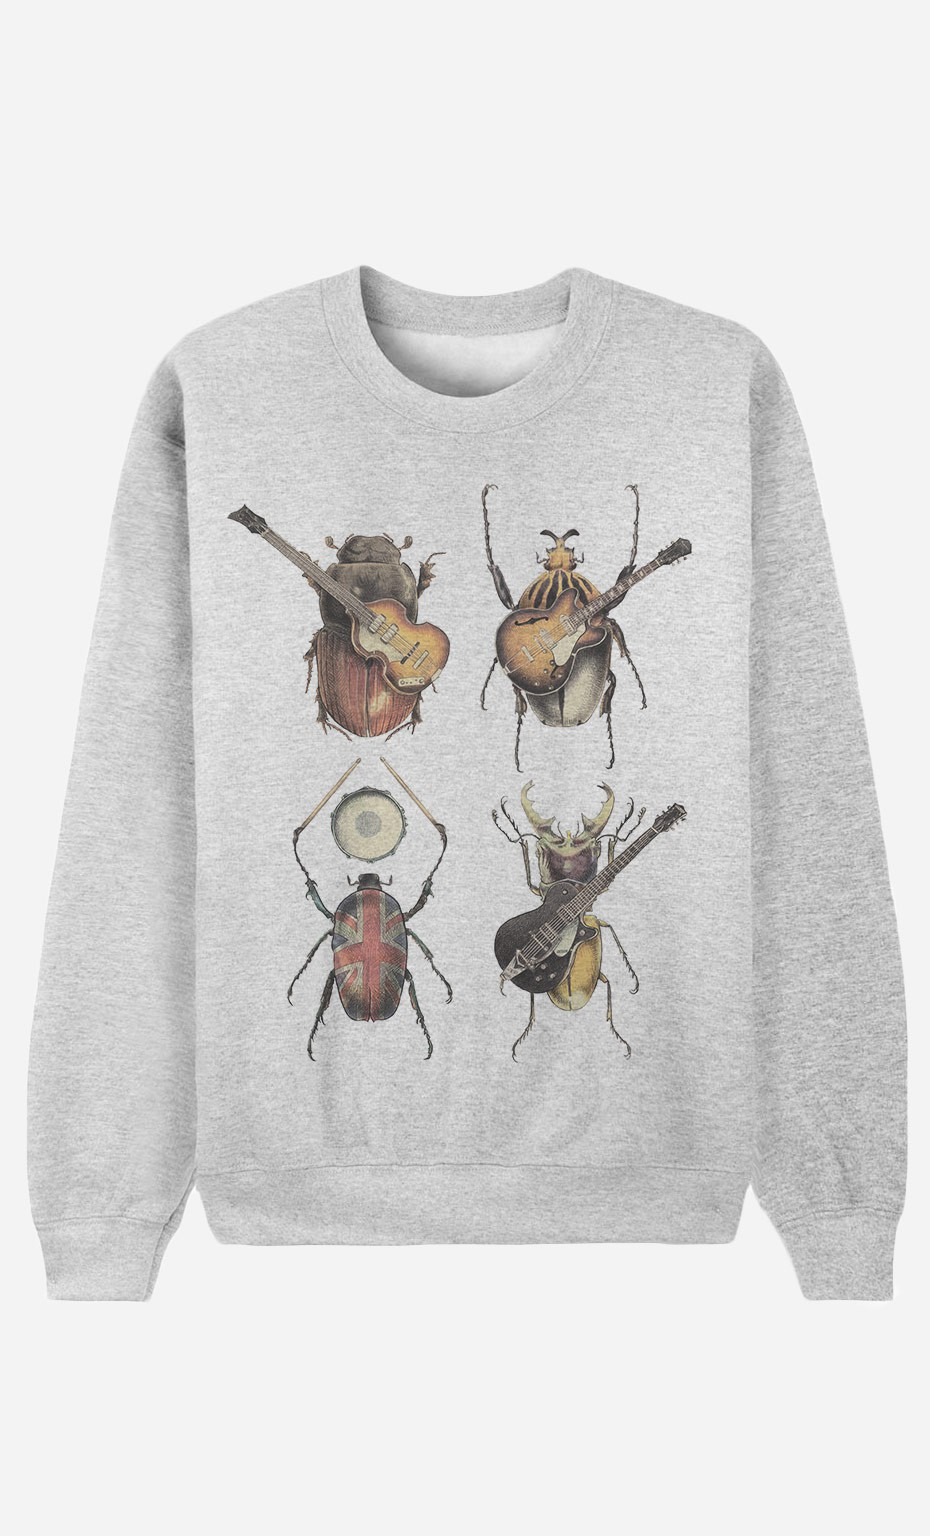 Sweatshirt Beetles